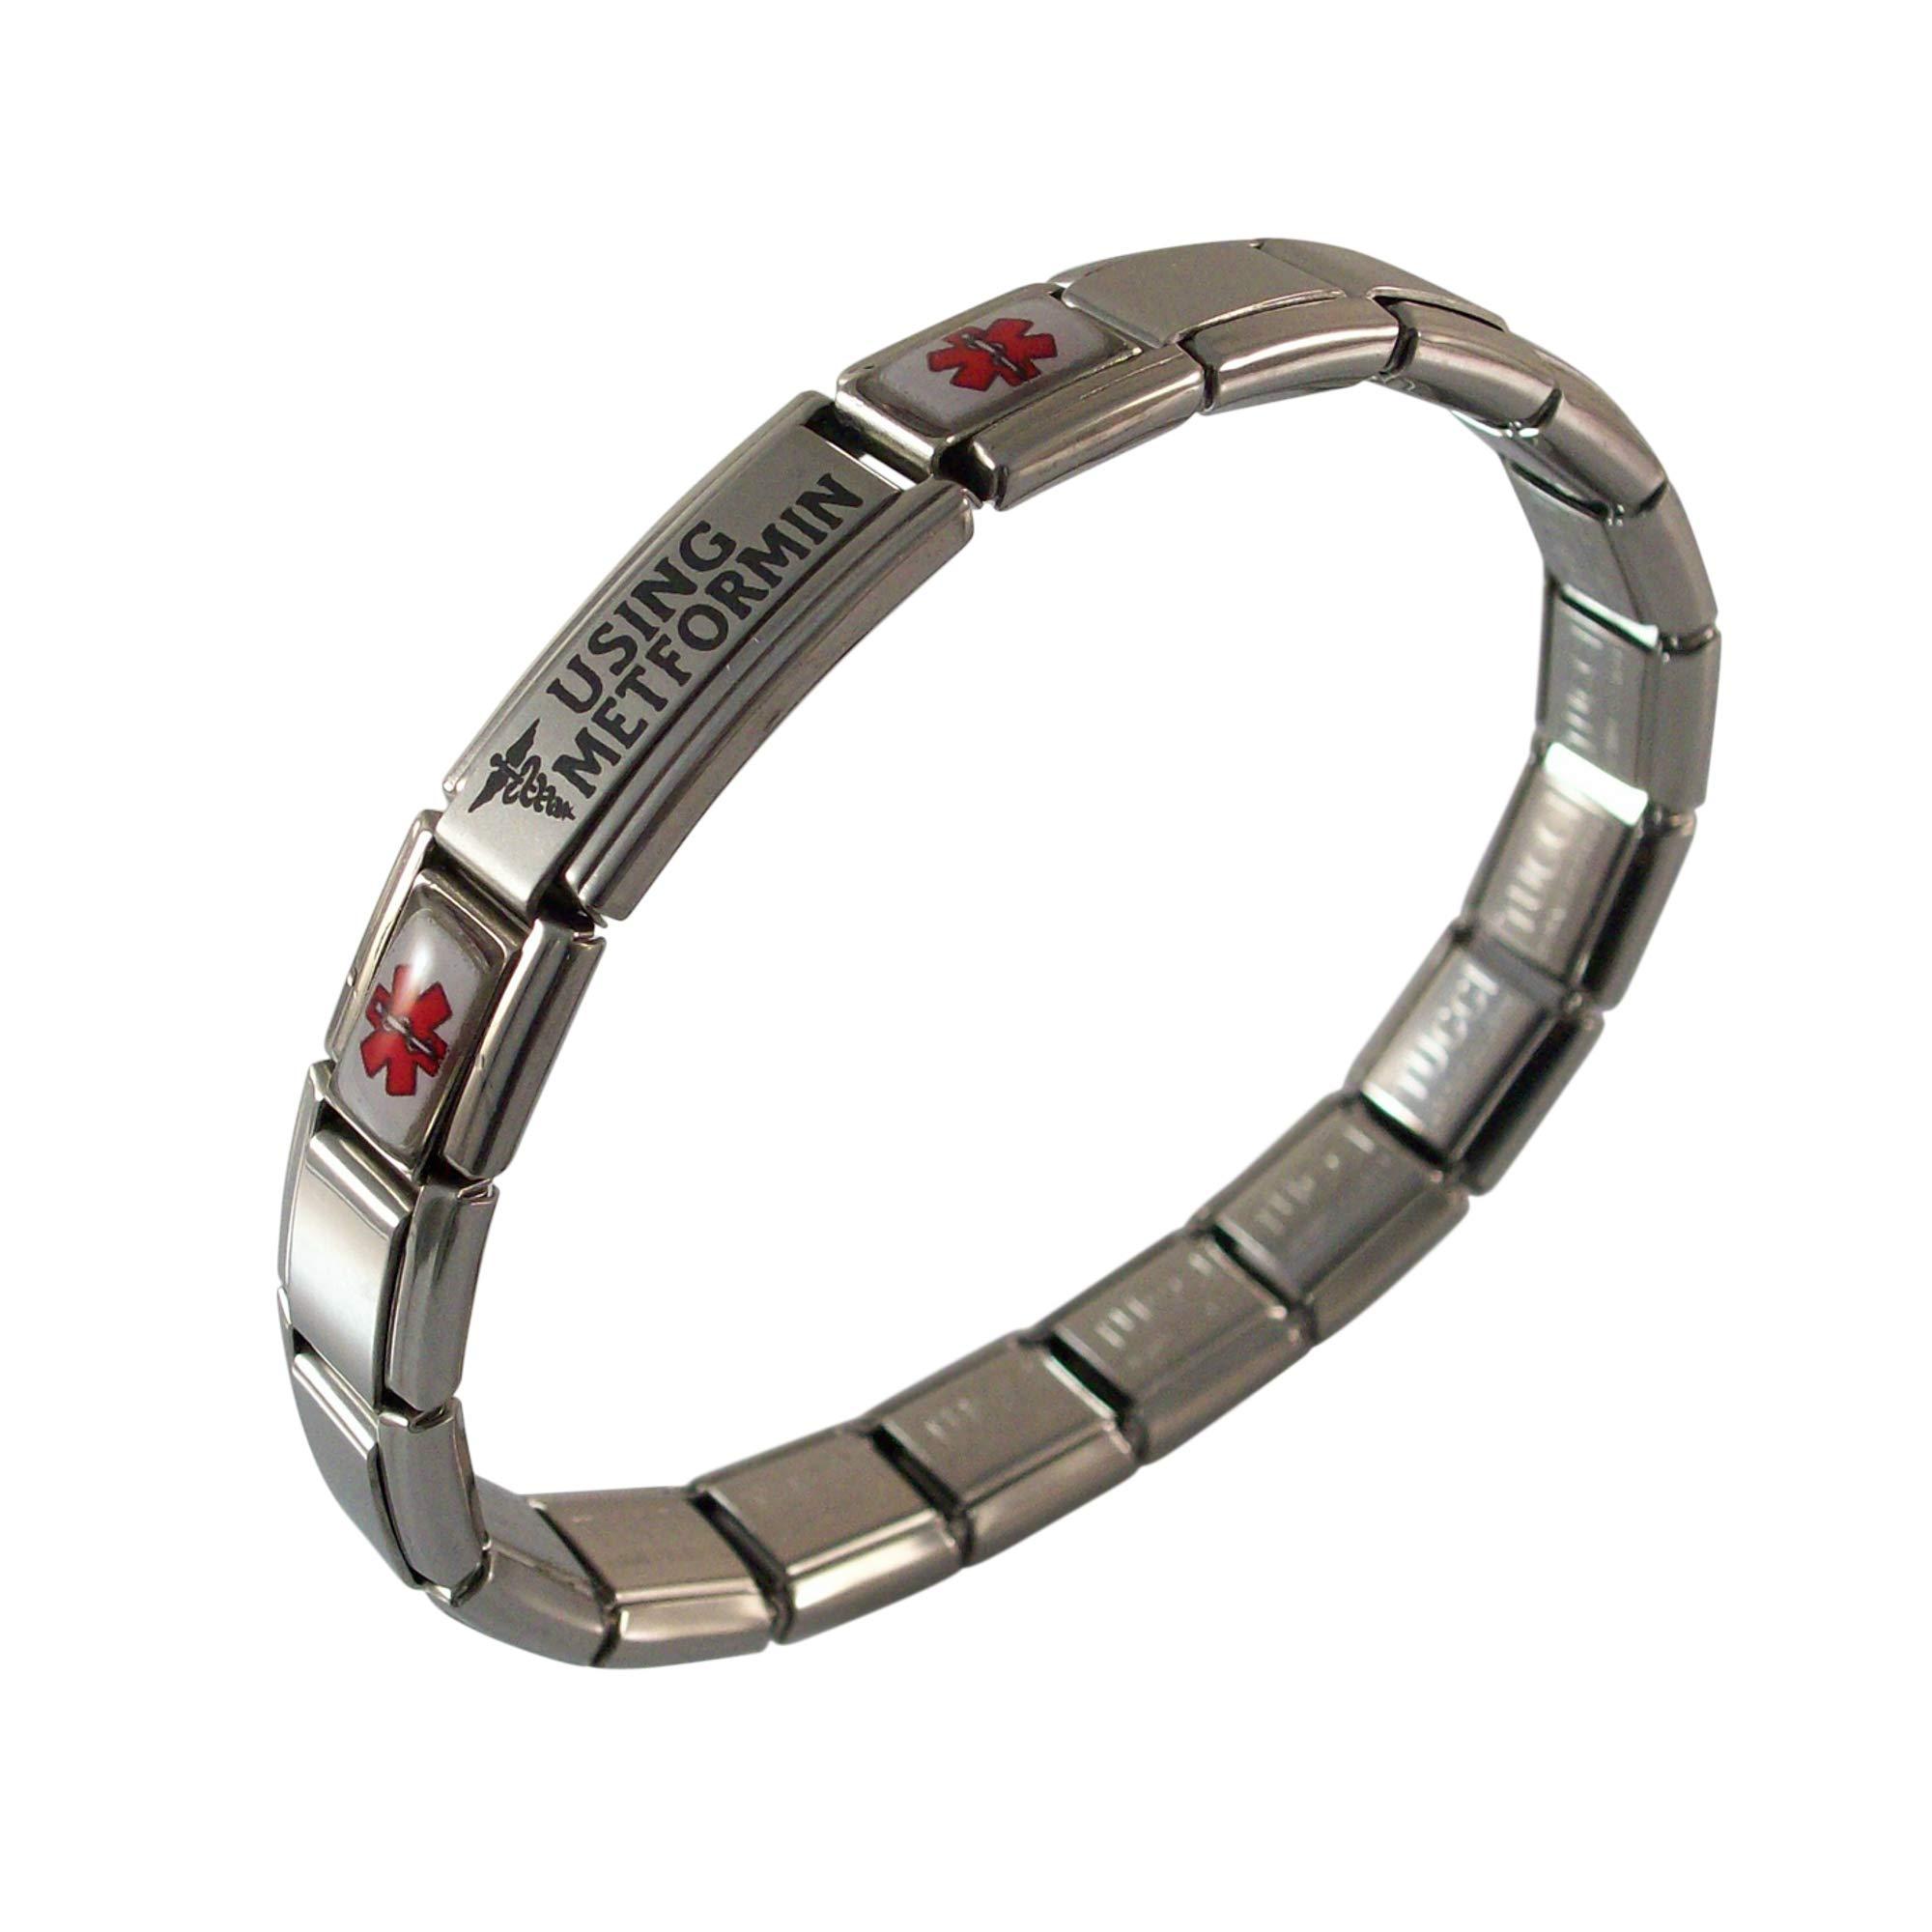 Gadow Jewelry Metformin Medical Alert Italian Charm Bracelet